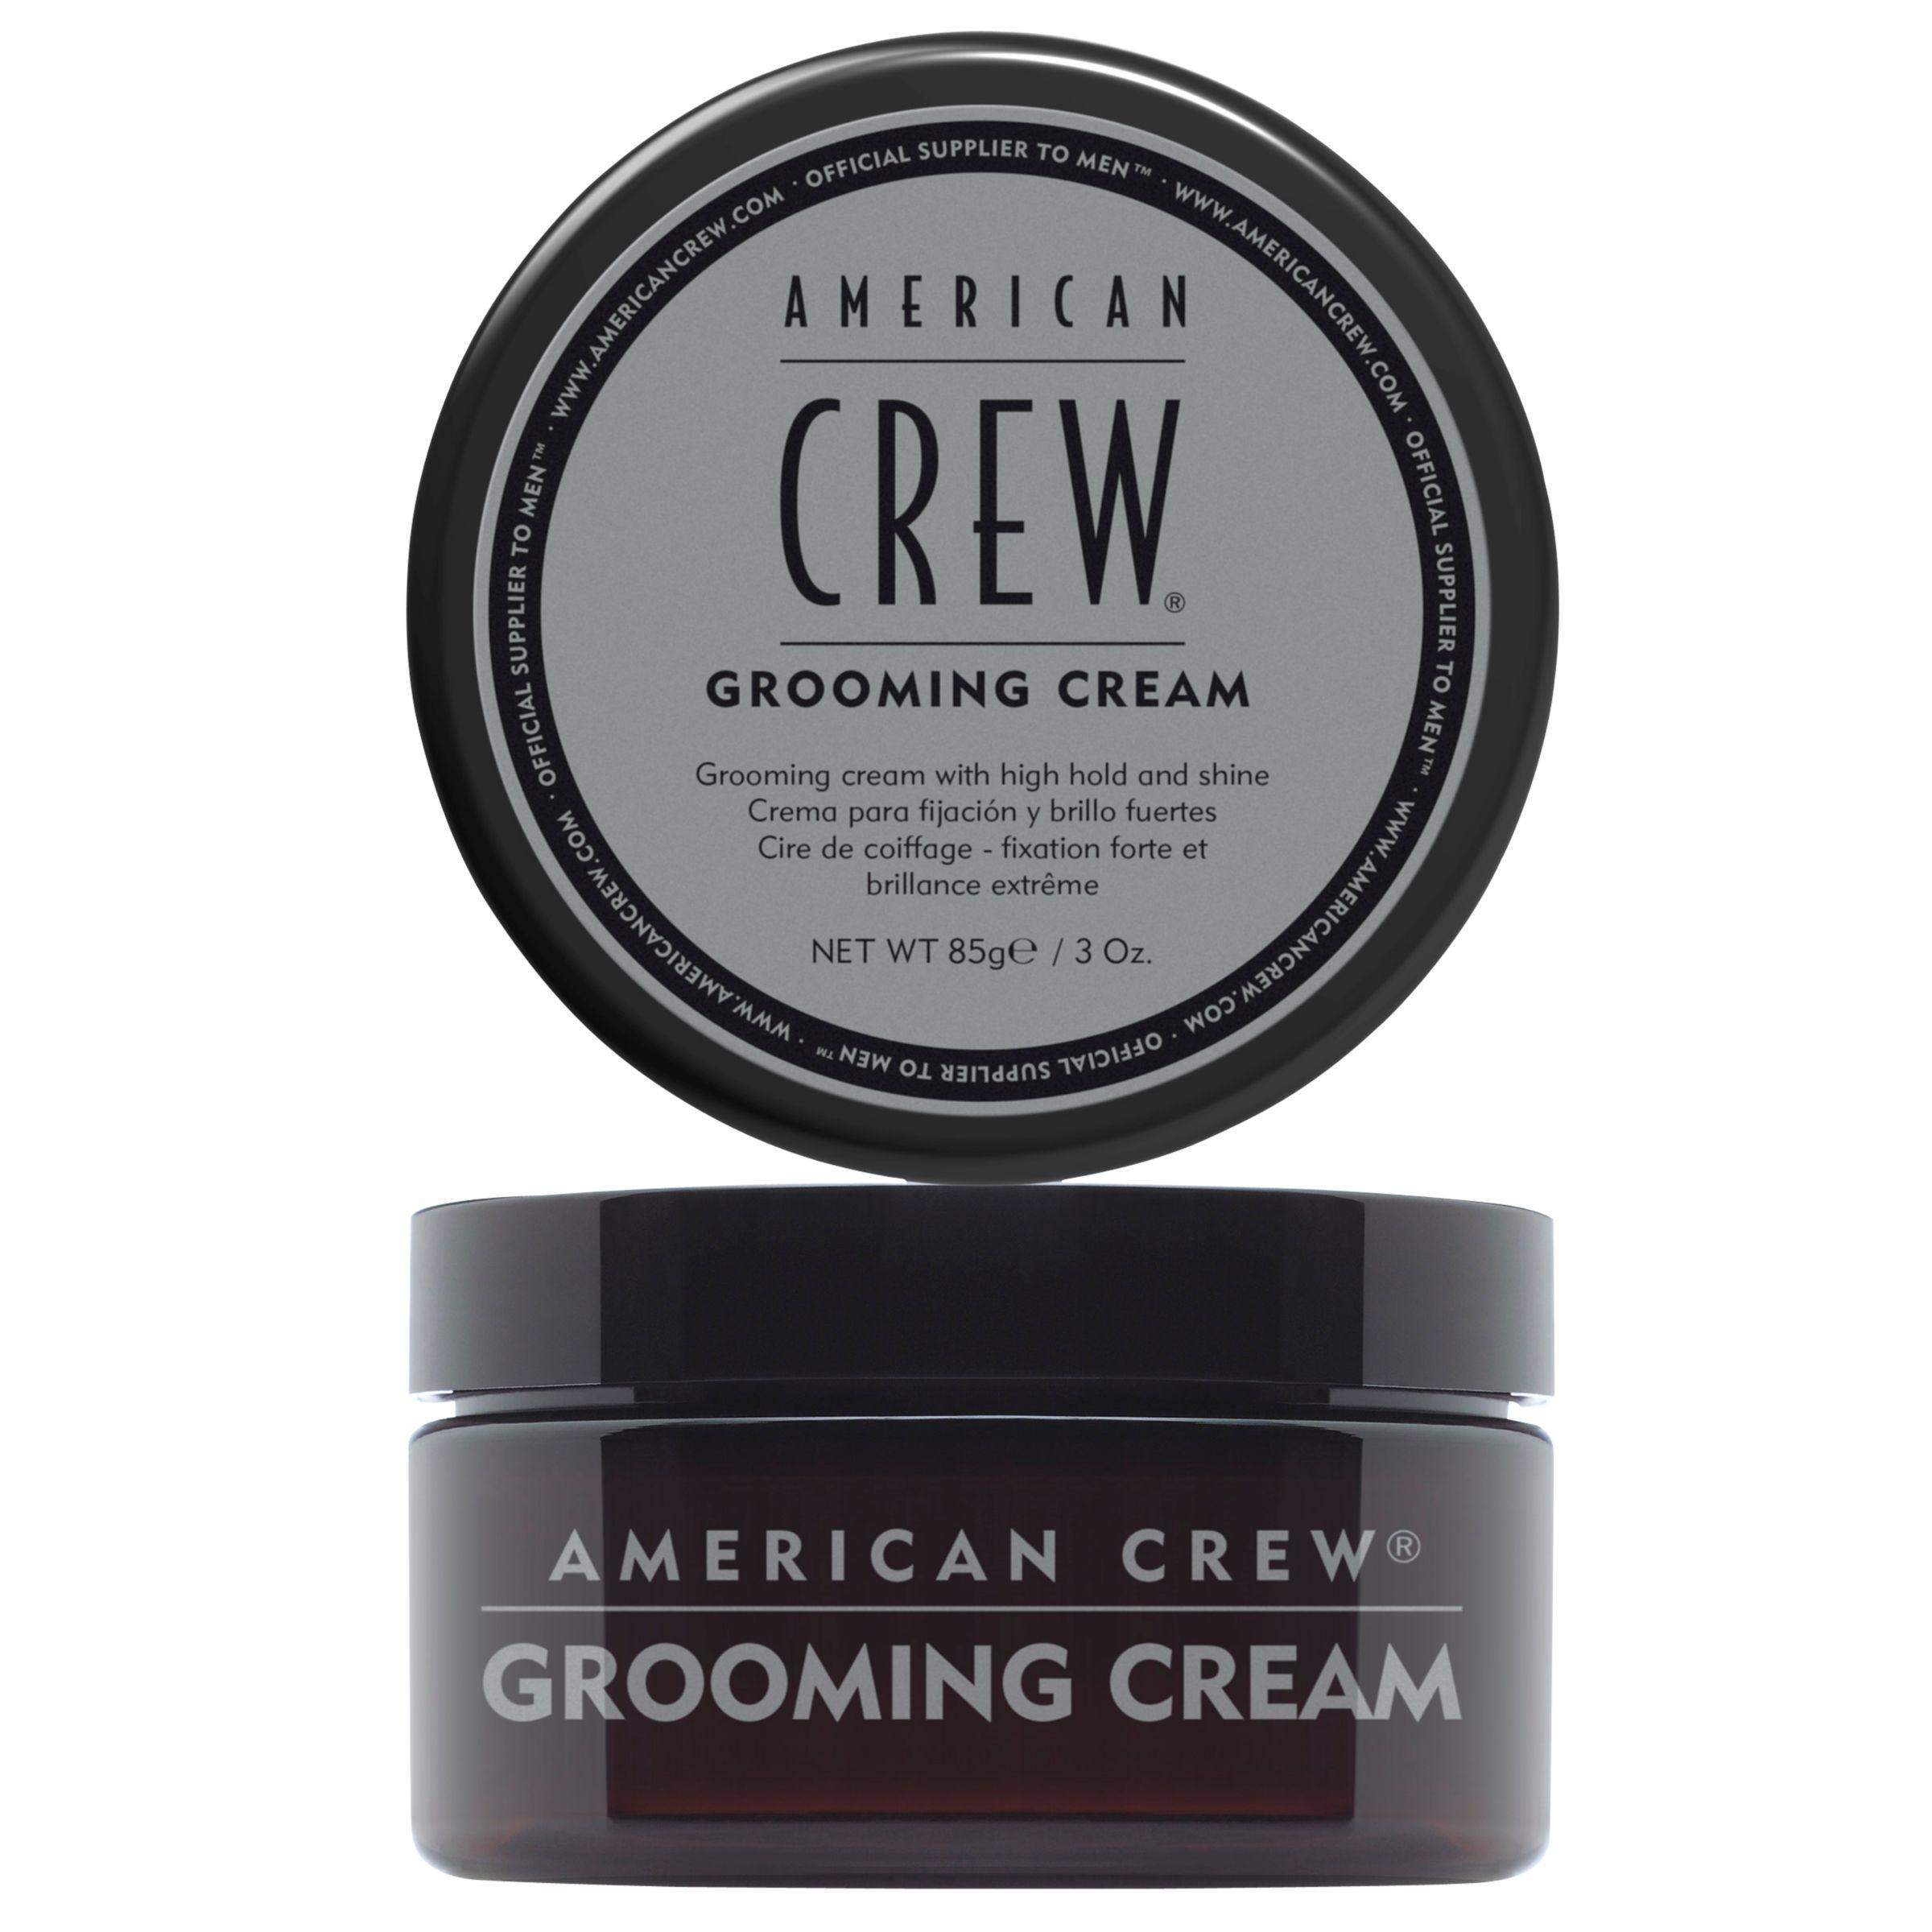 American Crew American Crew Grooming Cream, 85g